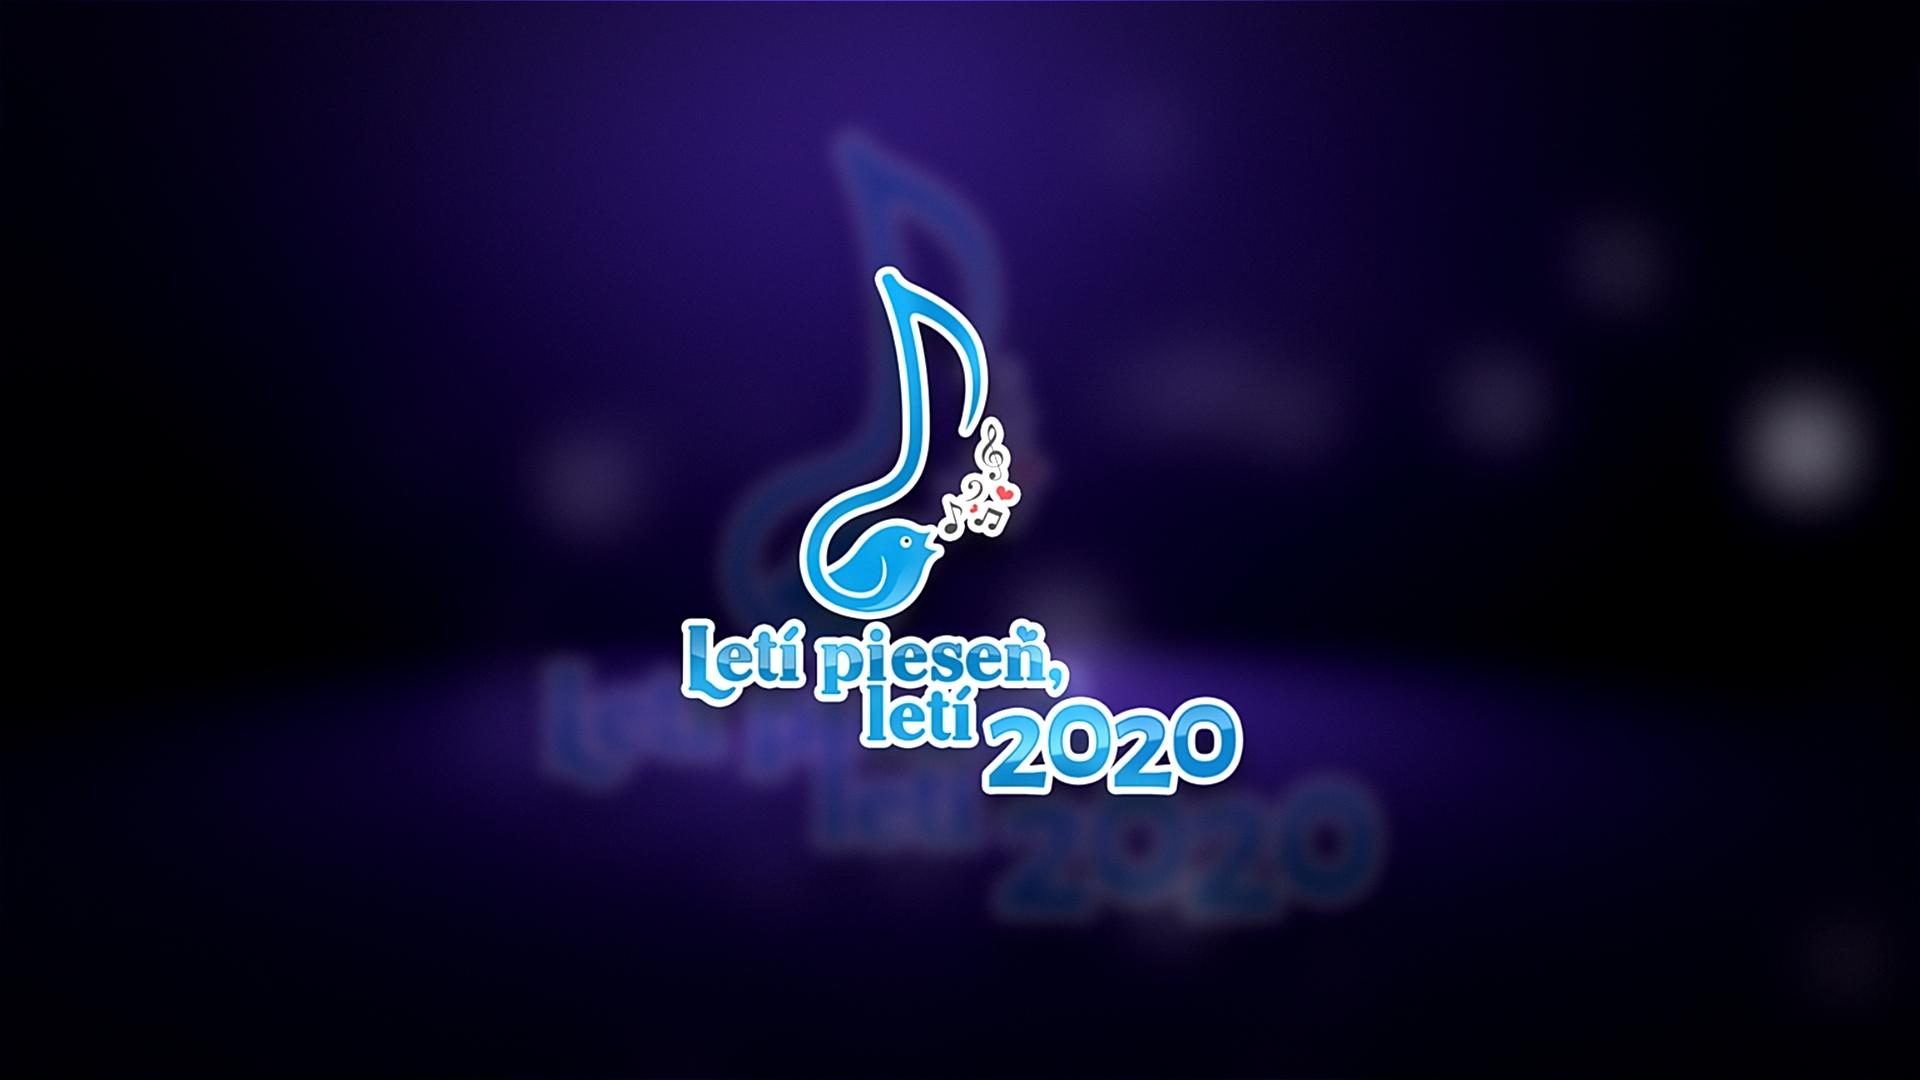 Letí pieseň, letí 2020